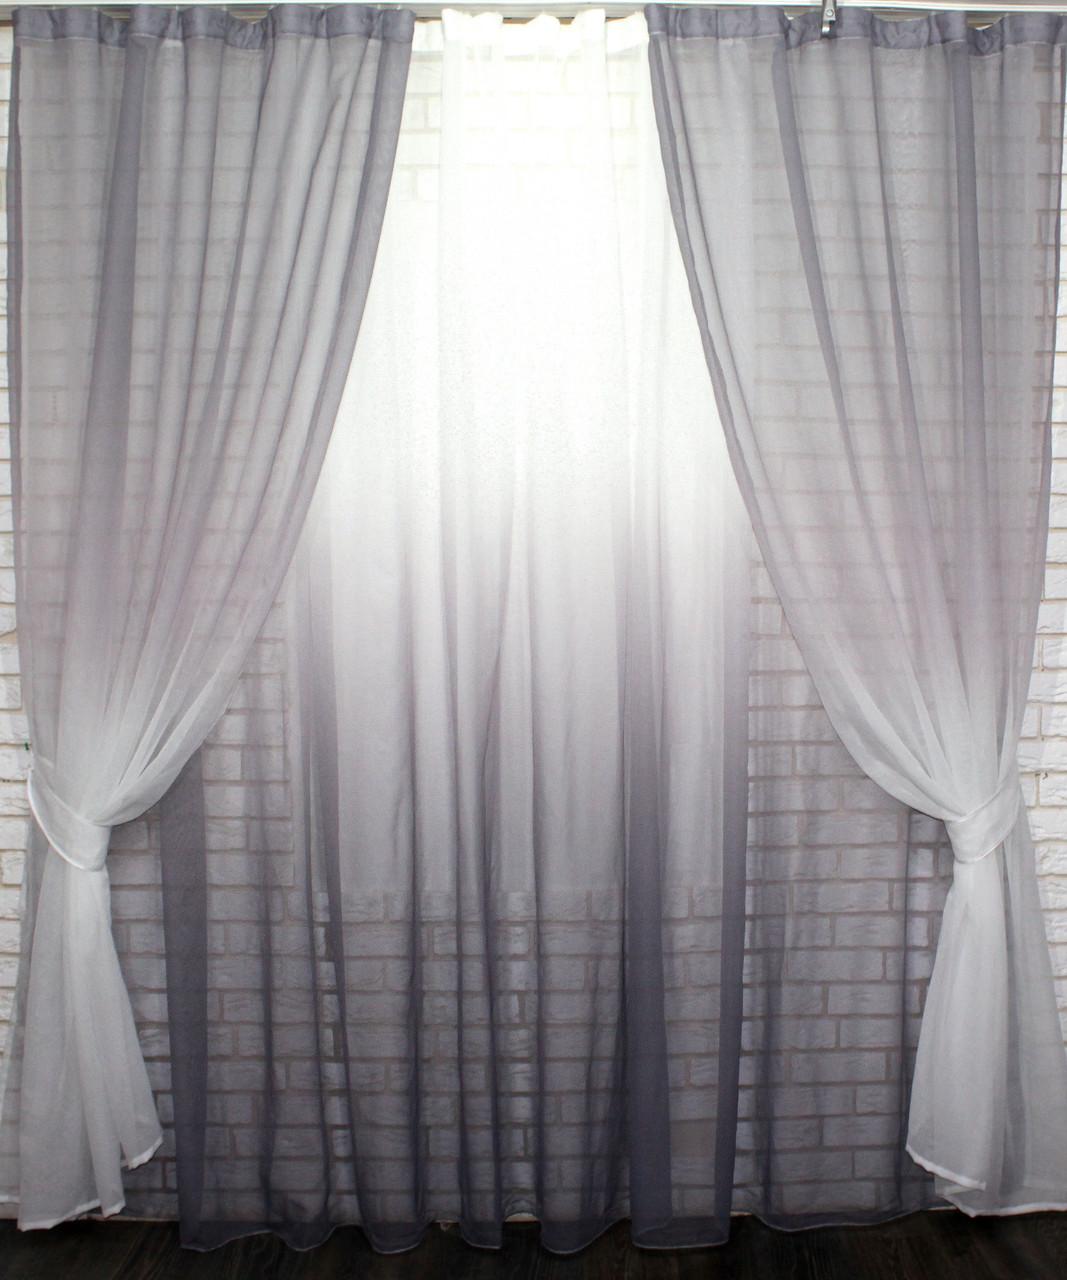 "Комплект растяжка ""Омбре"", ткань батист, под лён.  (2шт. 1,5х2,5м.+4х2,5м.)   Цвет серый с белым 10-009"